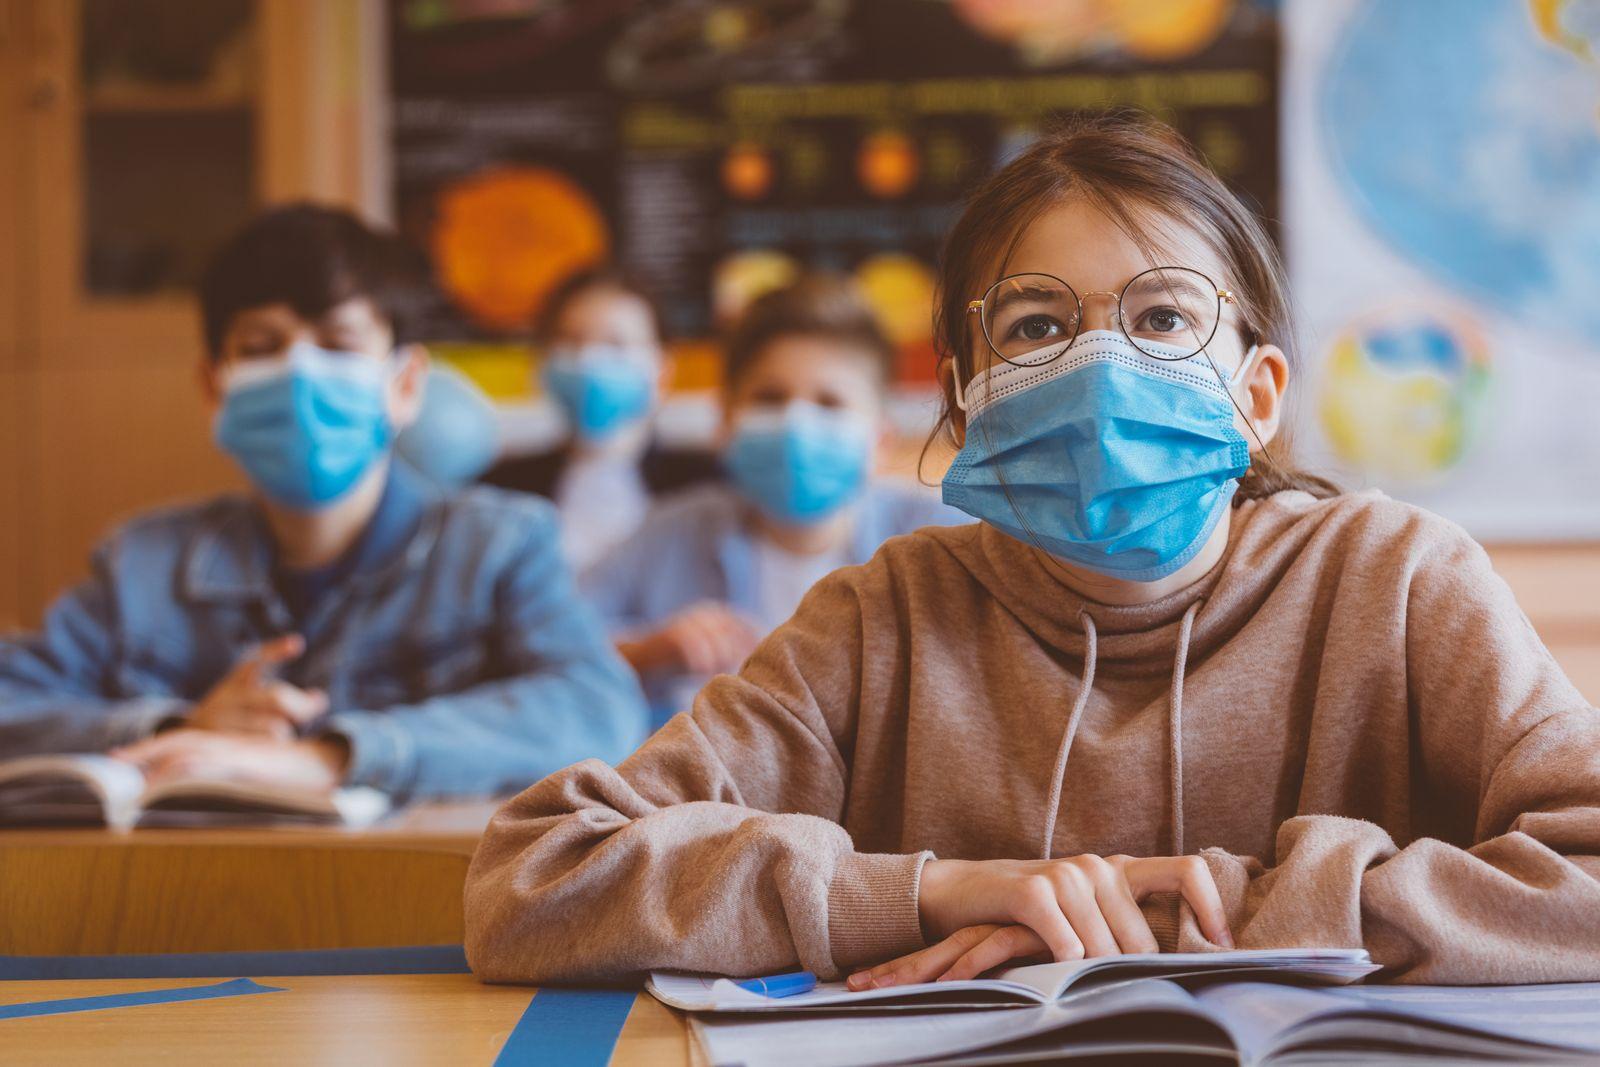 Teenage girl wearing N95 face mask at school